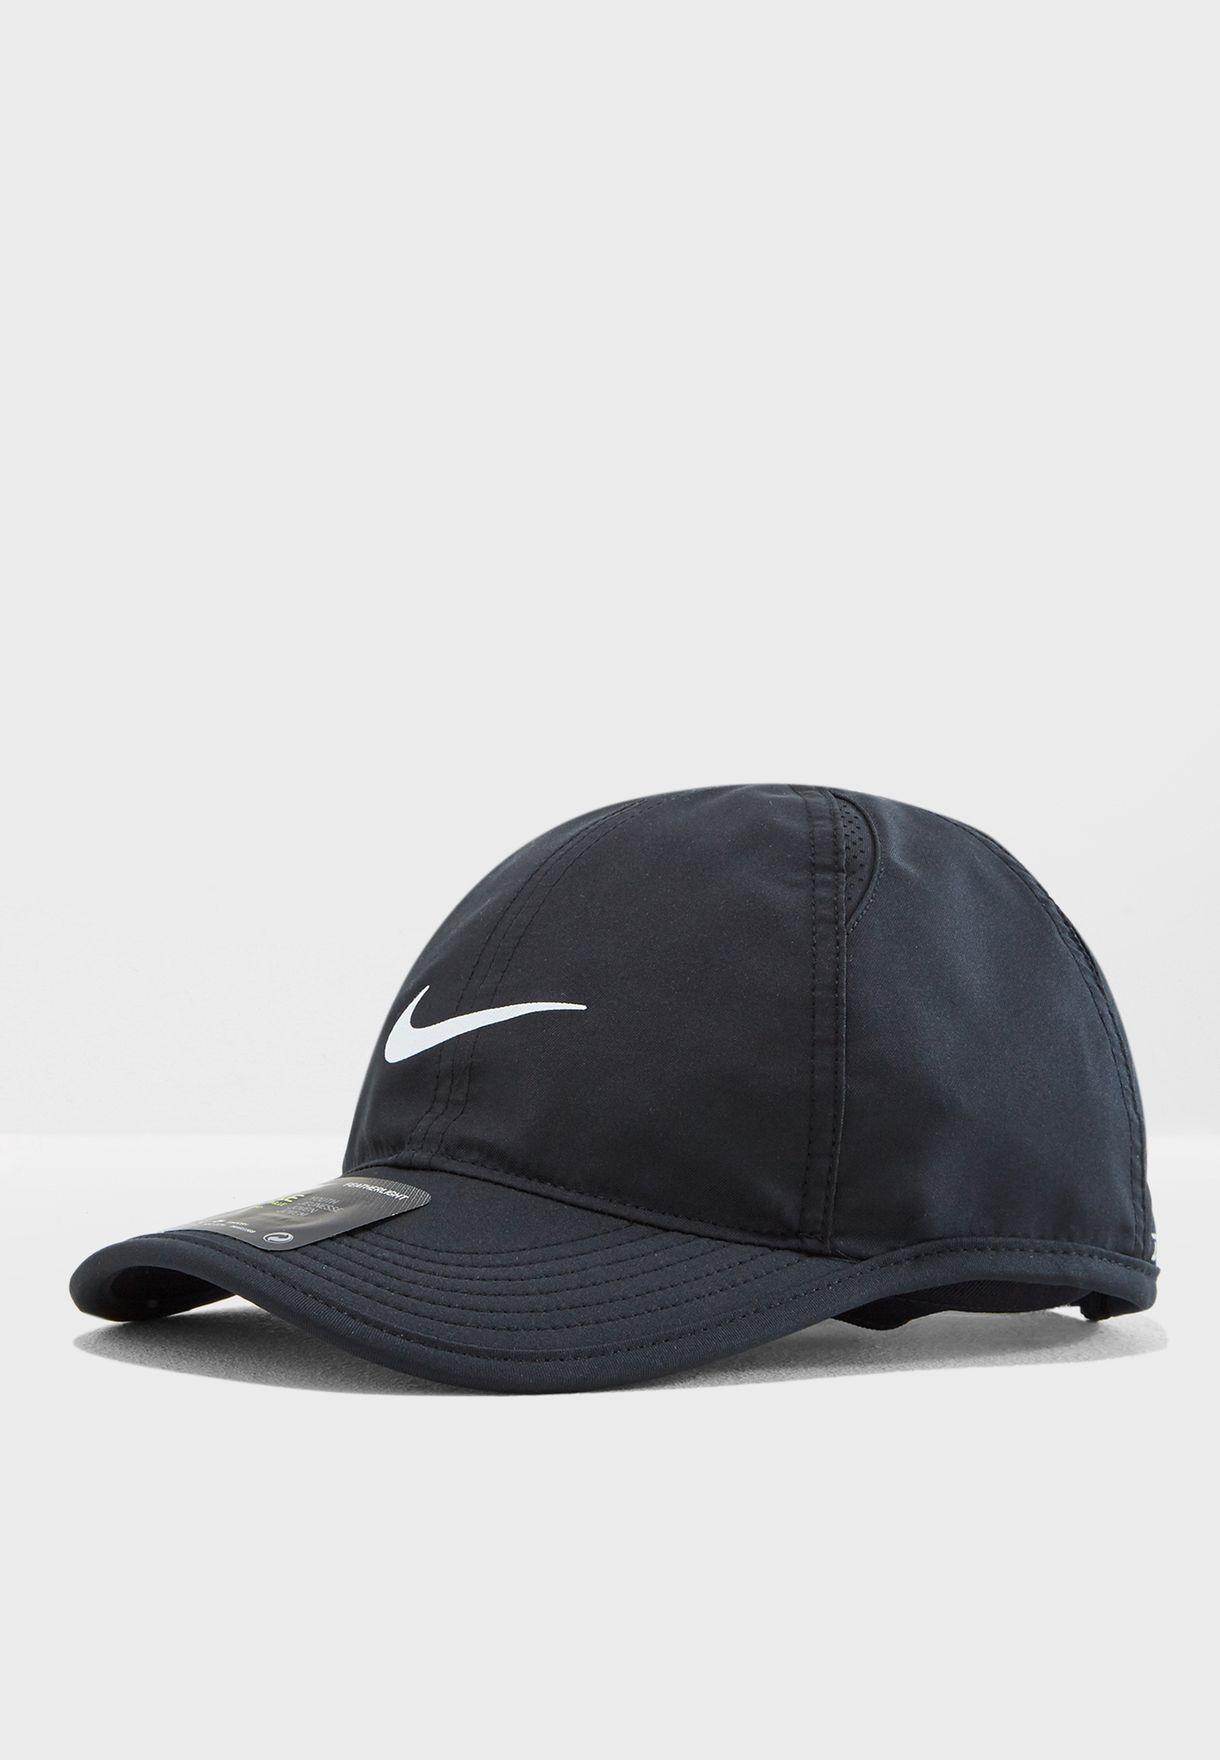 6bd9a75664e72 Shop Nike black Aerobill Featherlight Cap 739376-010 for Kids in UAE ...